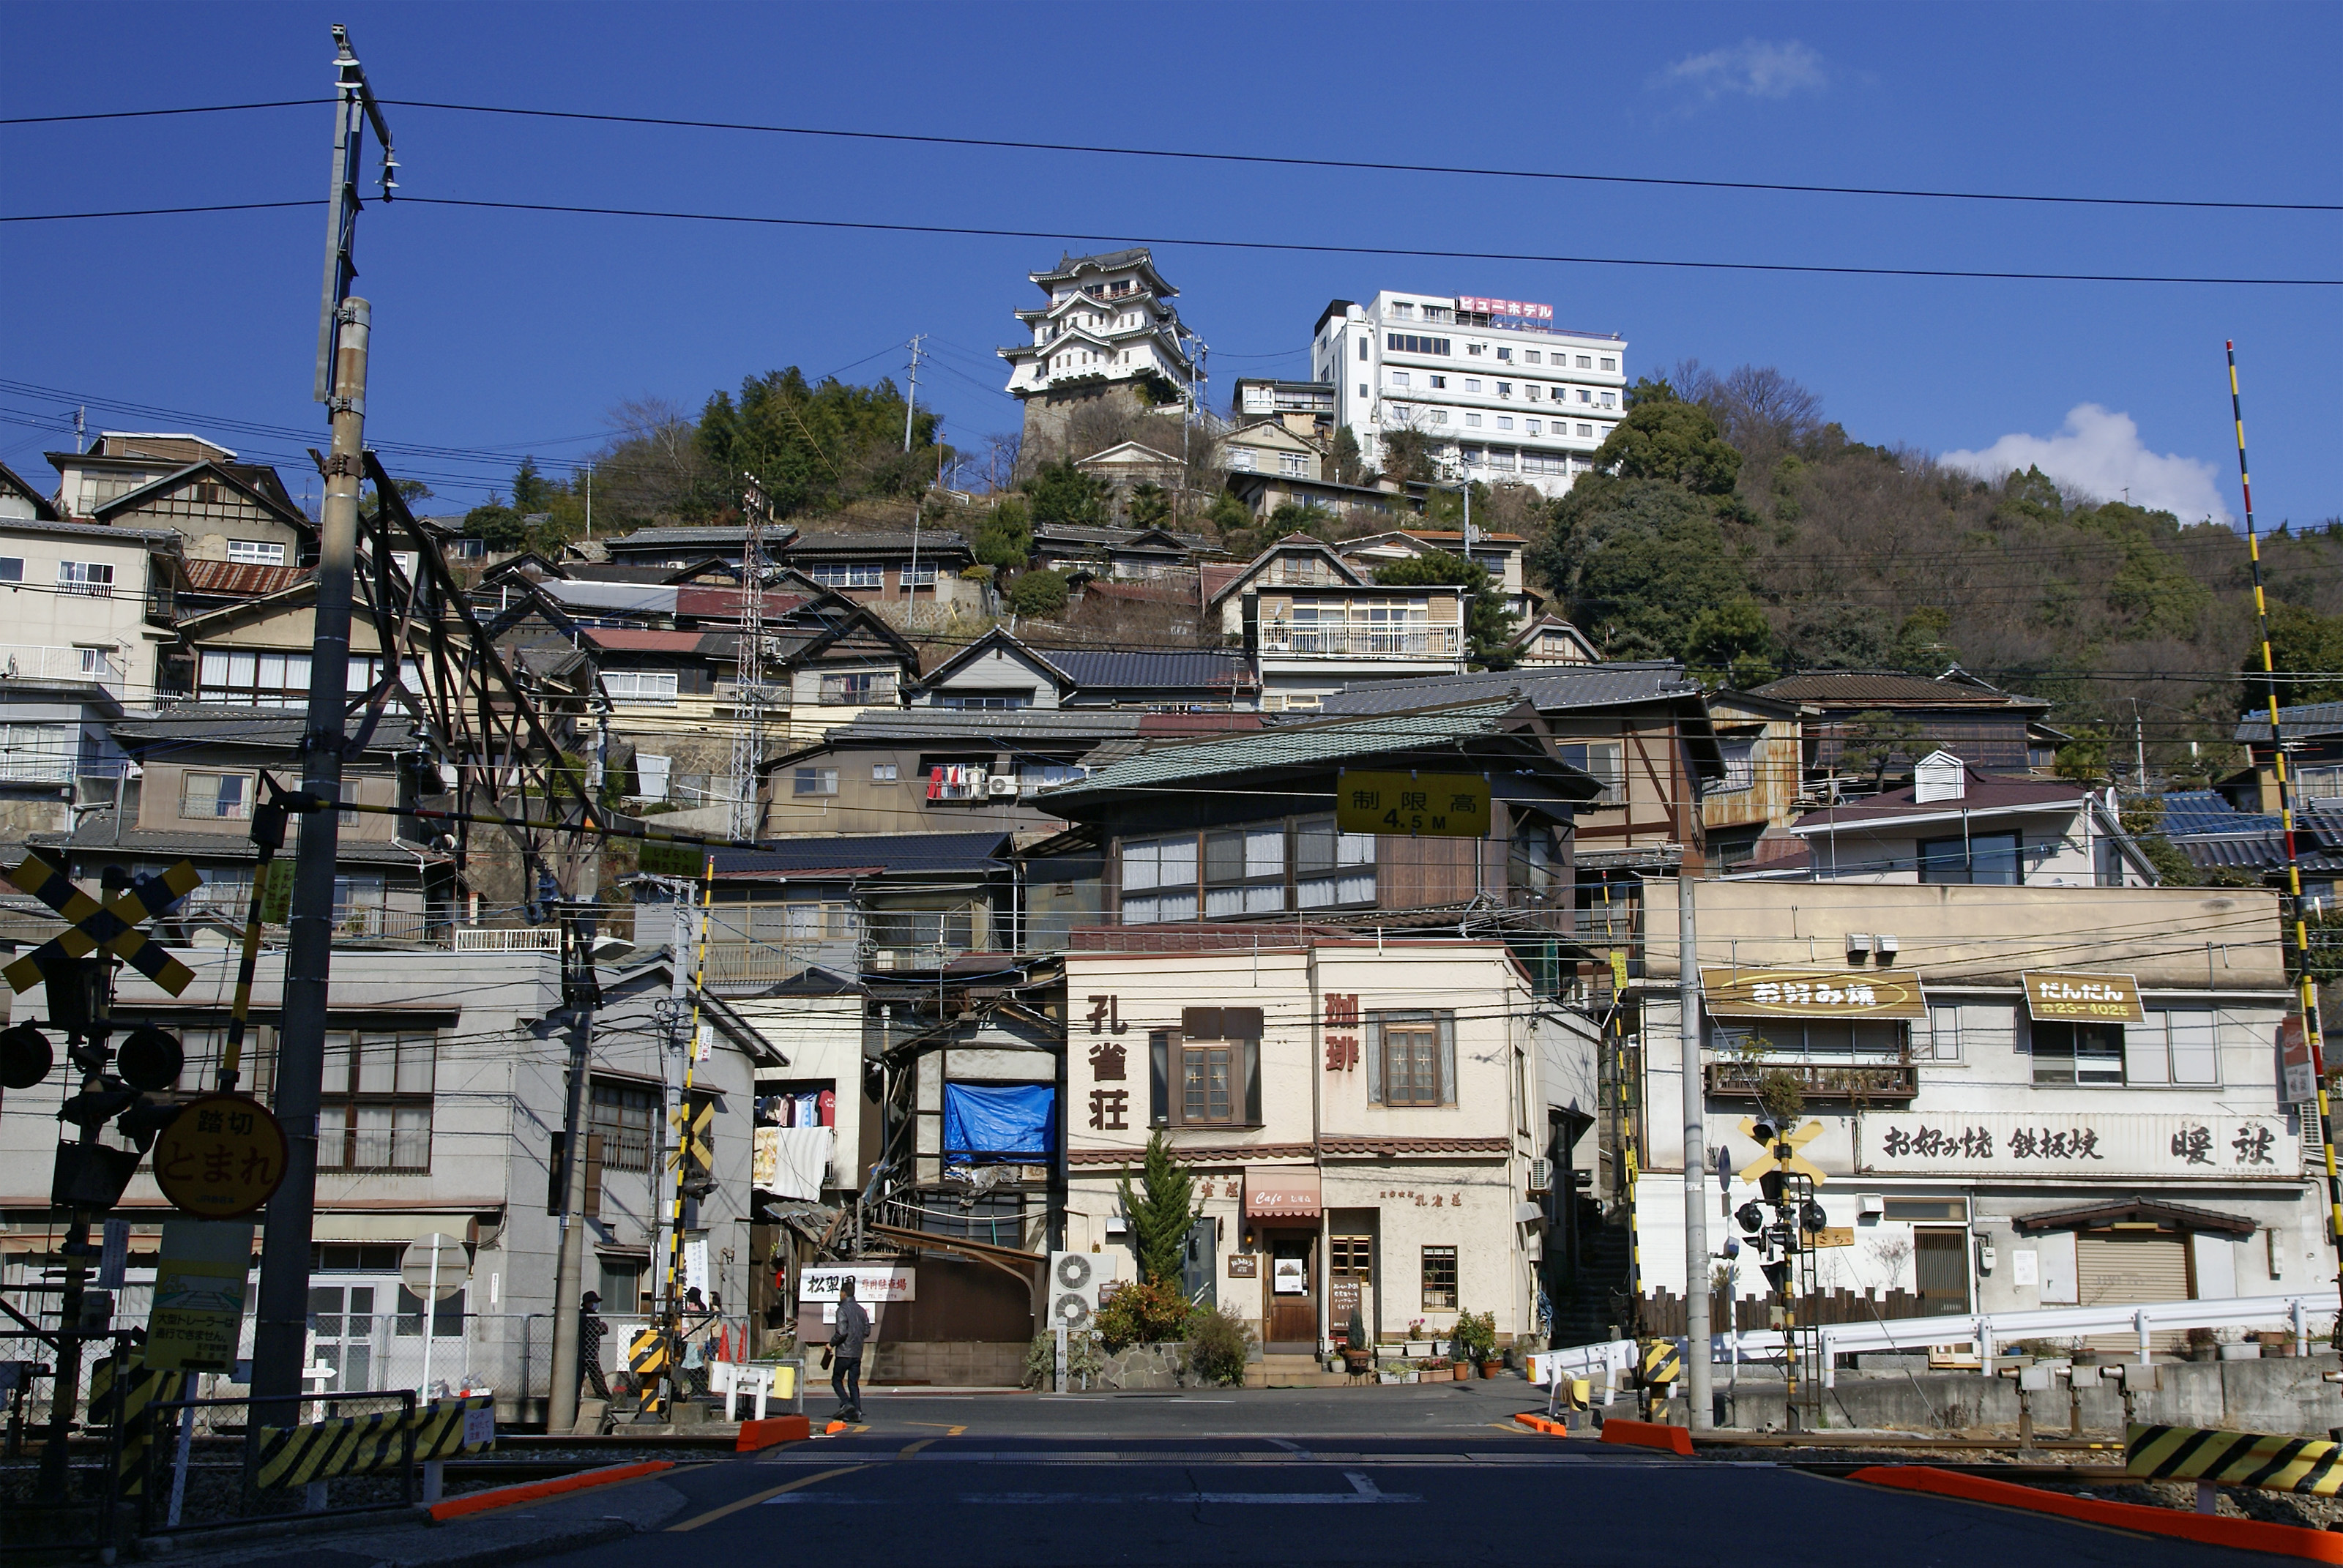 Onomichi Japan  City pictures : Onomichi castle01s3200 Wikimedia Commons